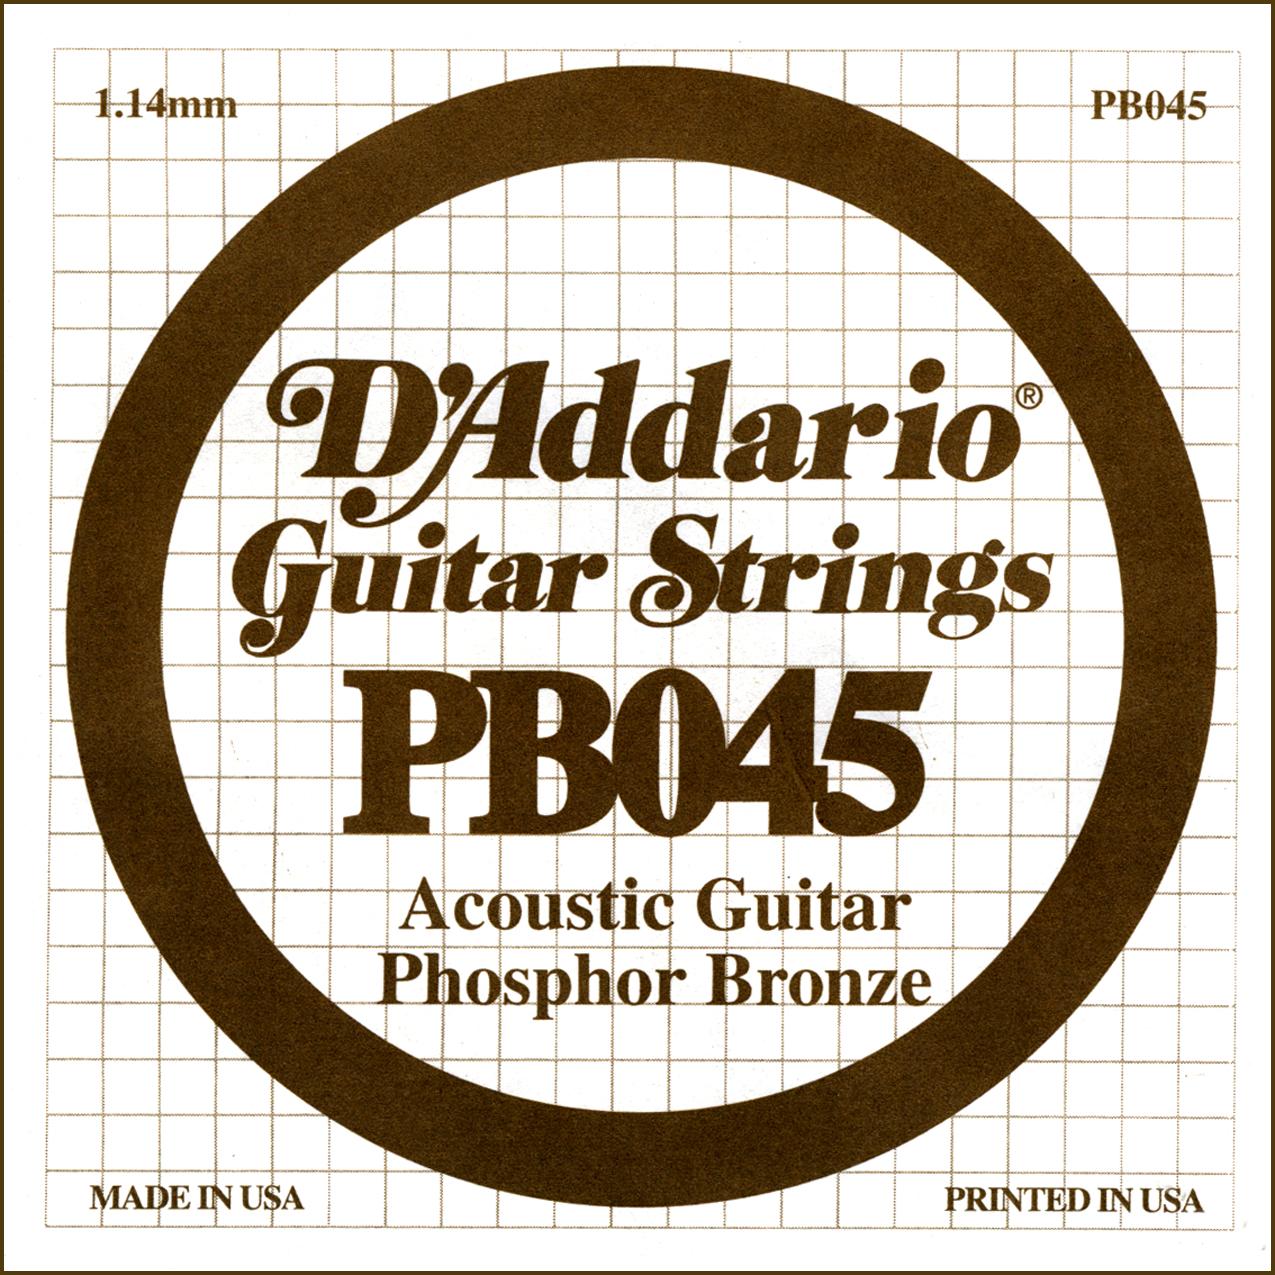 D'Addario Single Strings PBO45